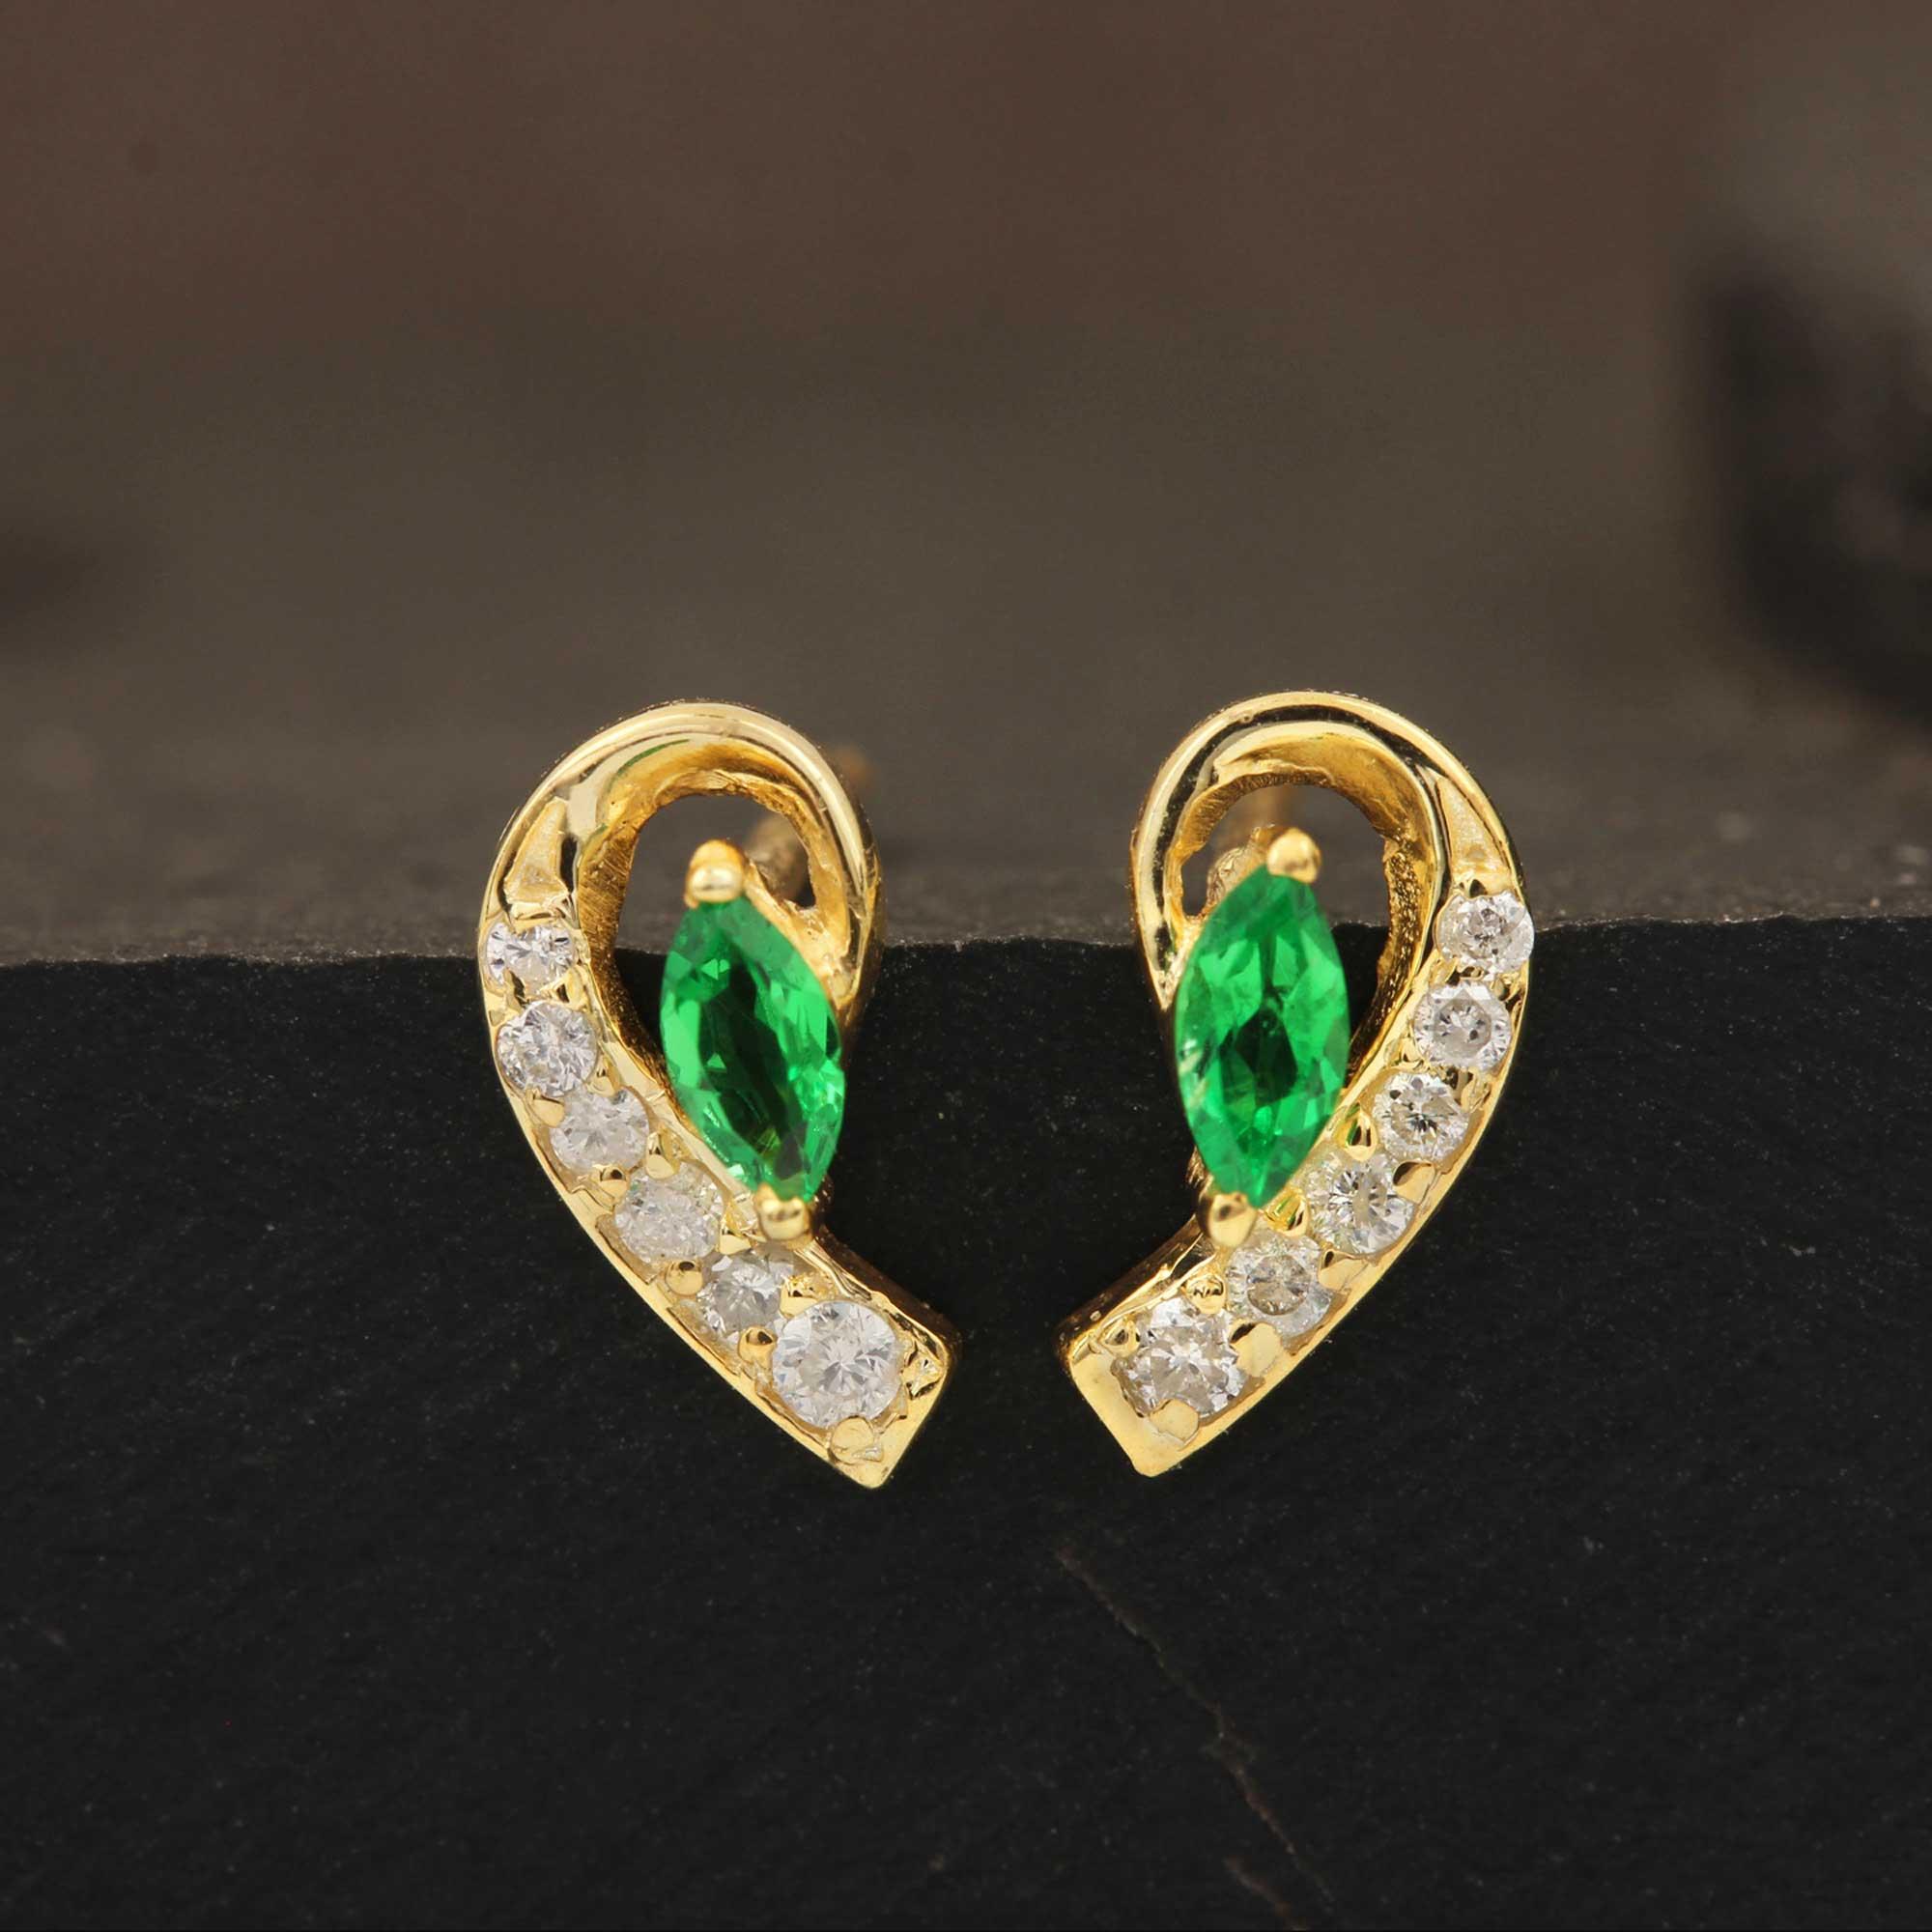 14k Solid Gold Stud Earrings Adorned With Diamond & Tsavorite Gemstone